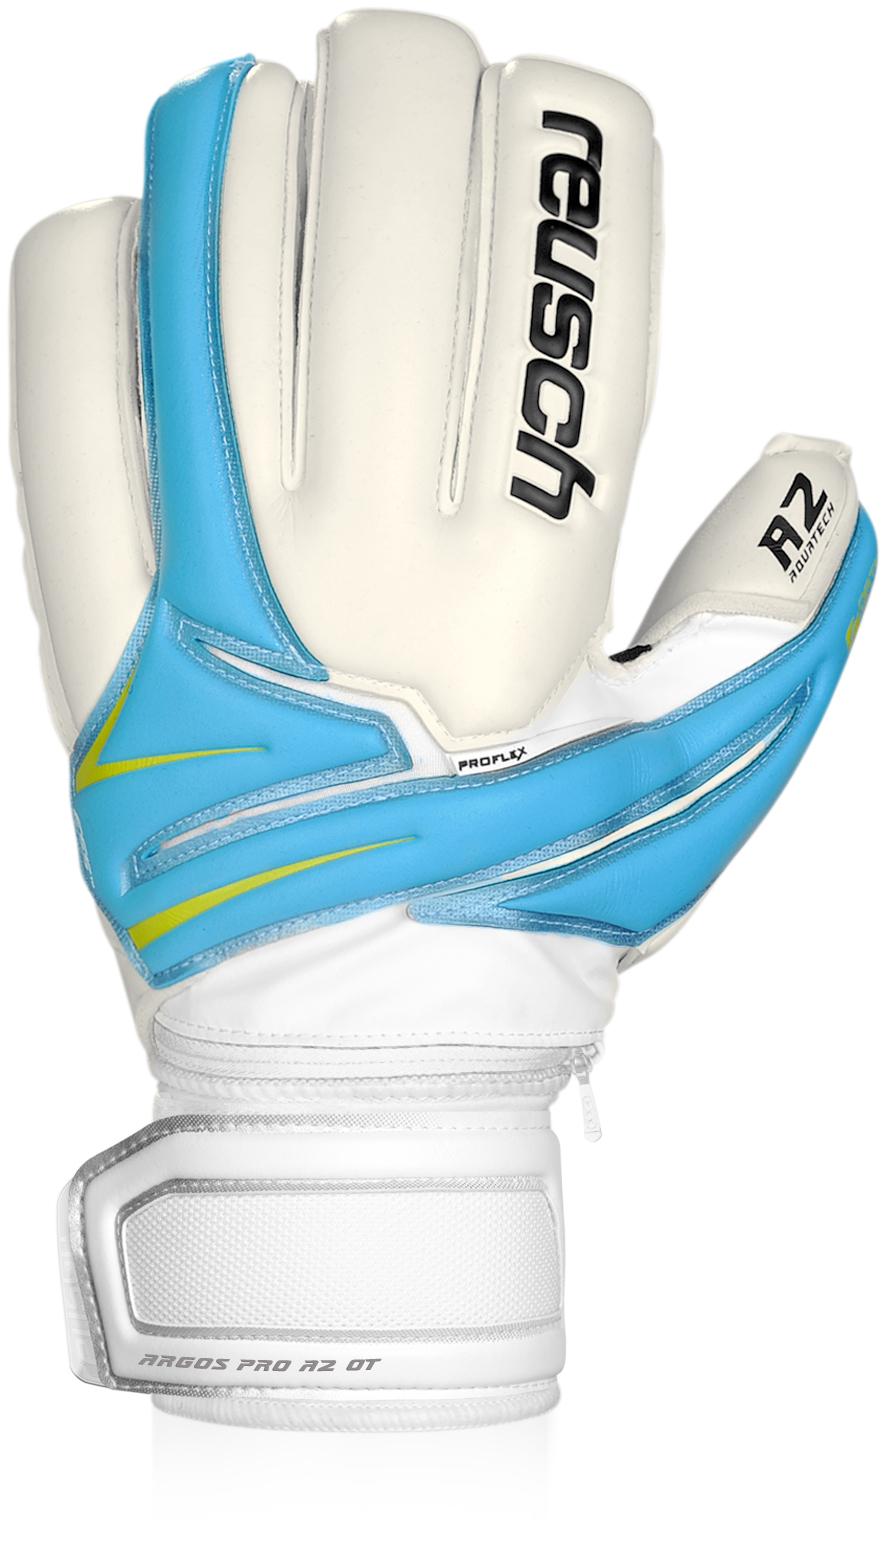 Reusch Argos Pro A2 Orthotec Goalkeeper Gloves (aqua)